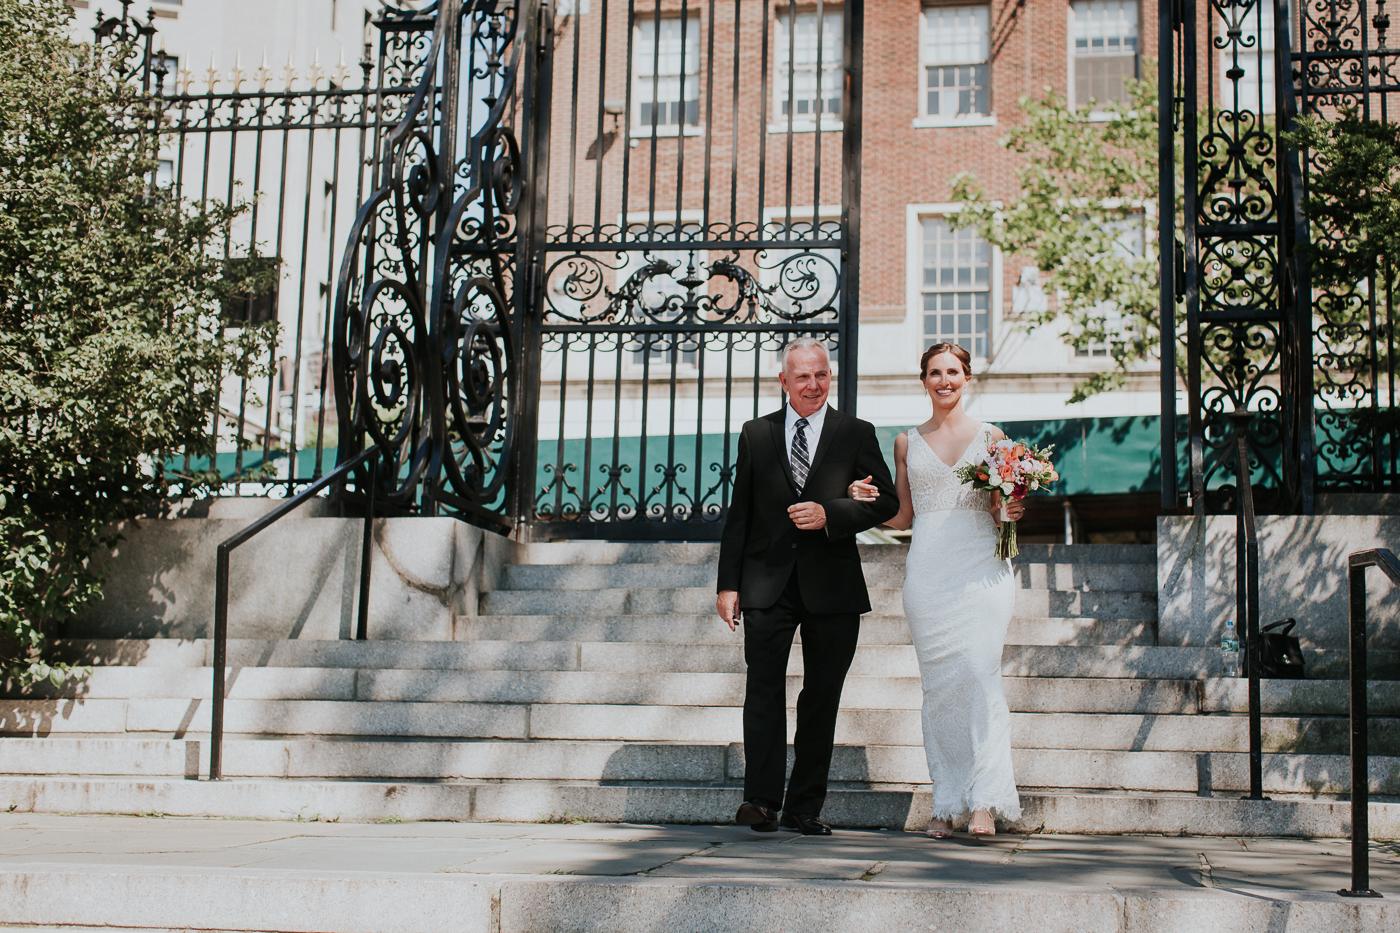 NYC-Central-Park-Conservatory-Garden-Intimate-Elopement-Documentary-Wedding-Photographer-19.jpg